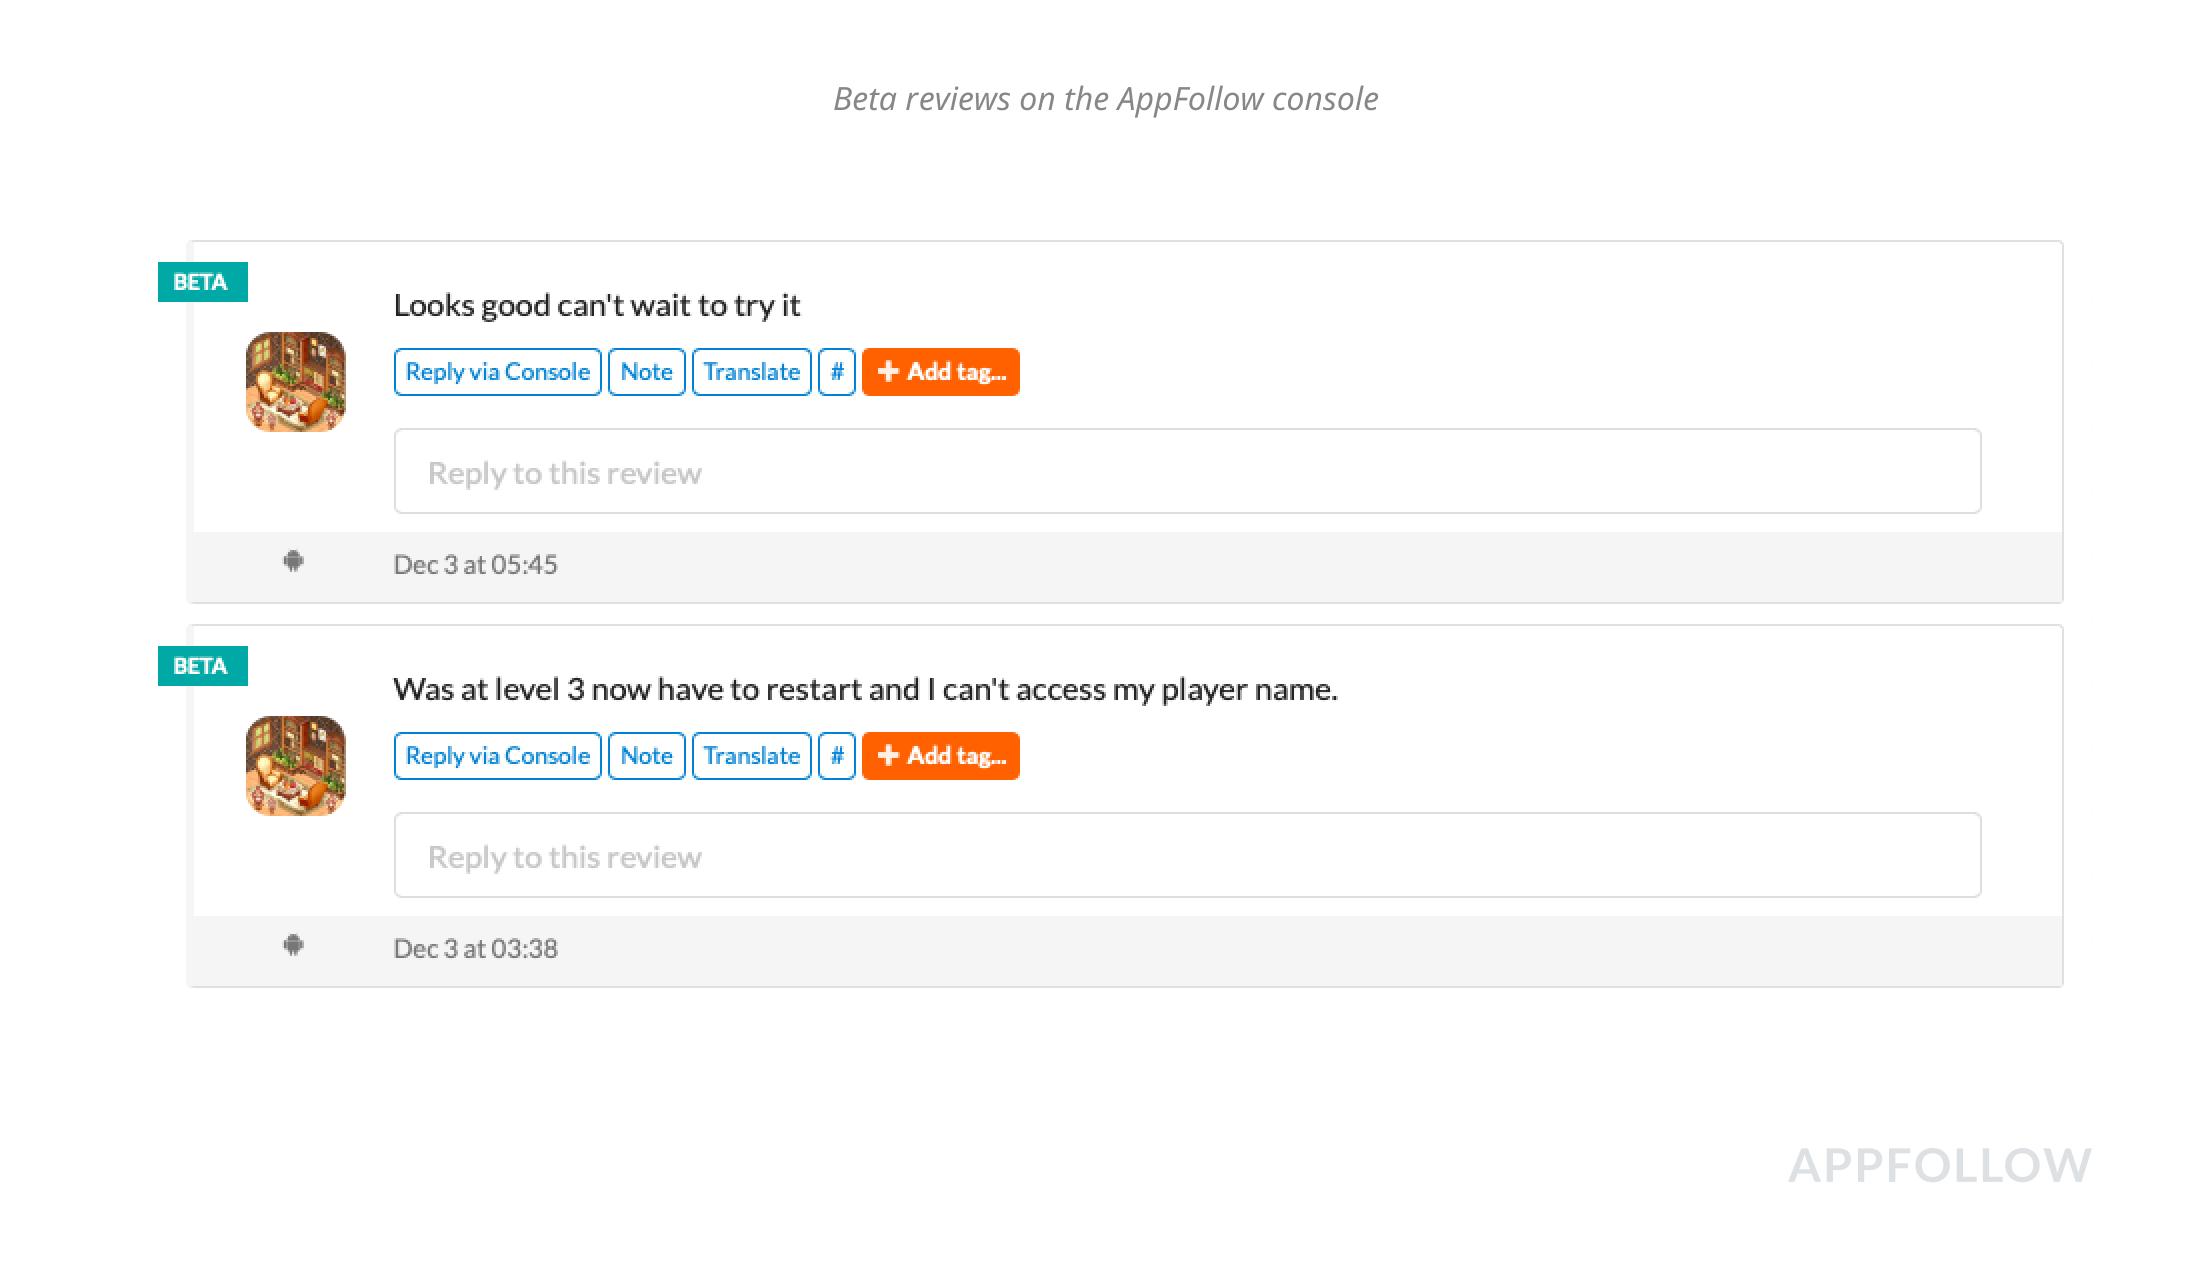 AppFollow 콘솔의 베타 리뷰